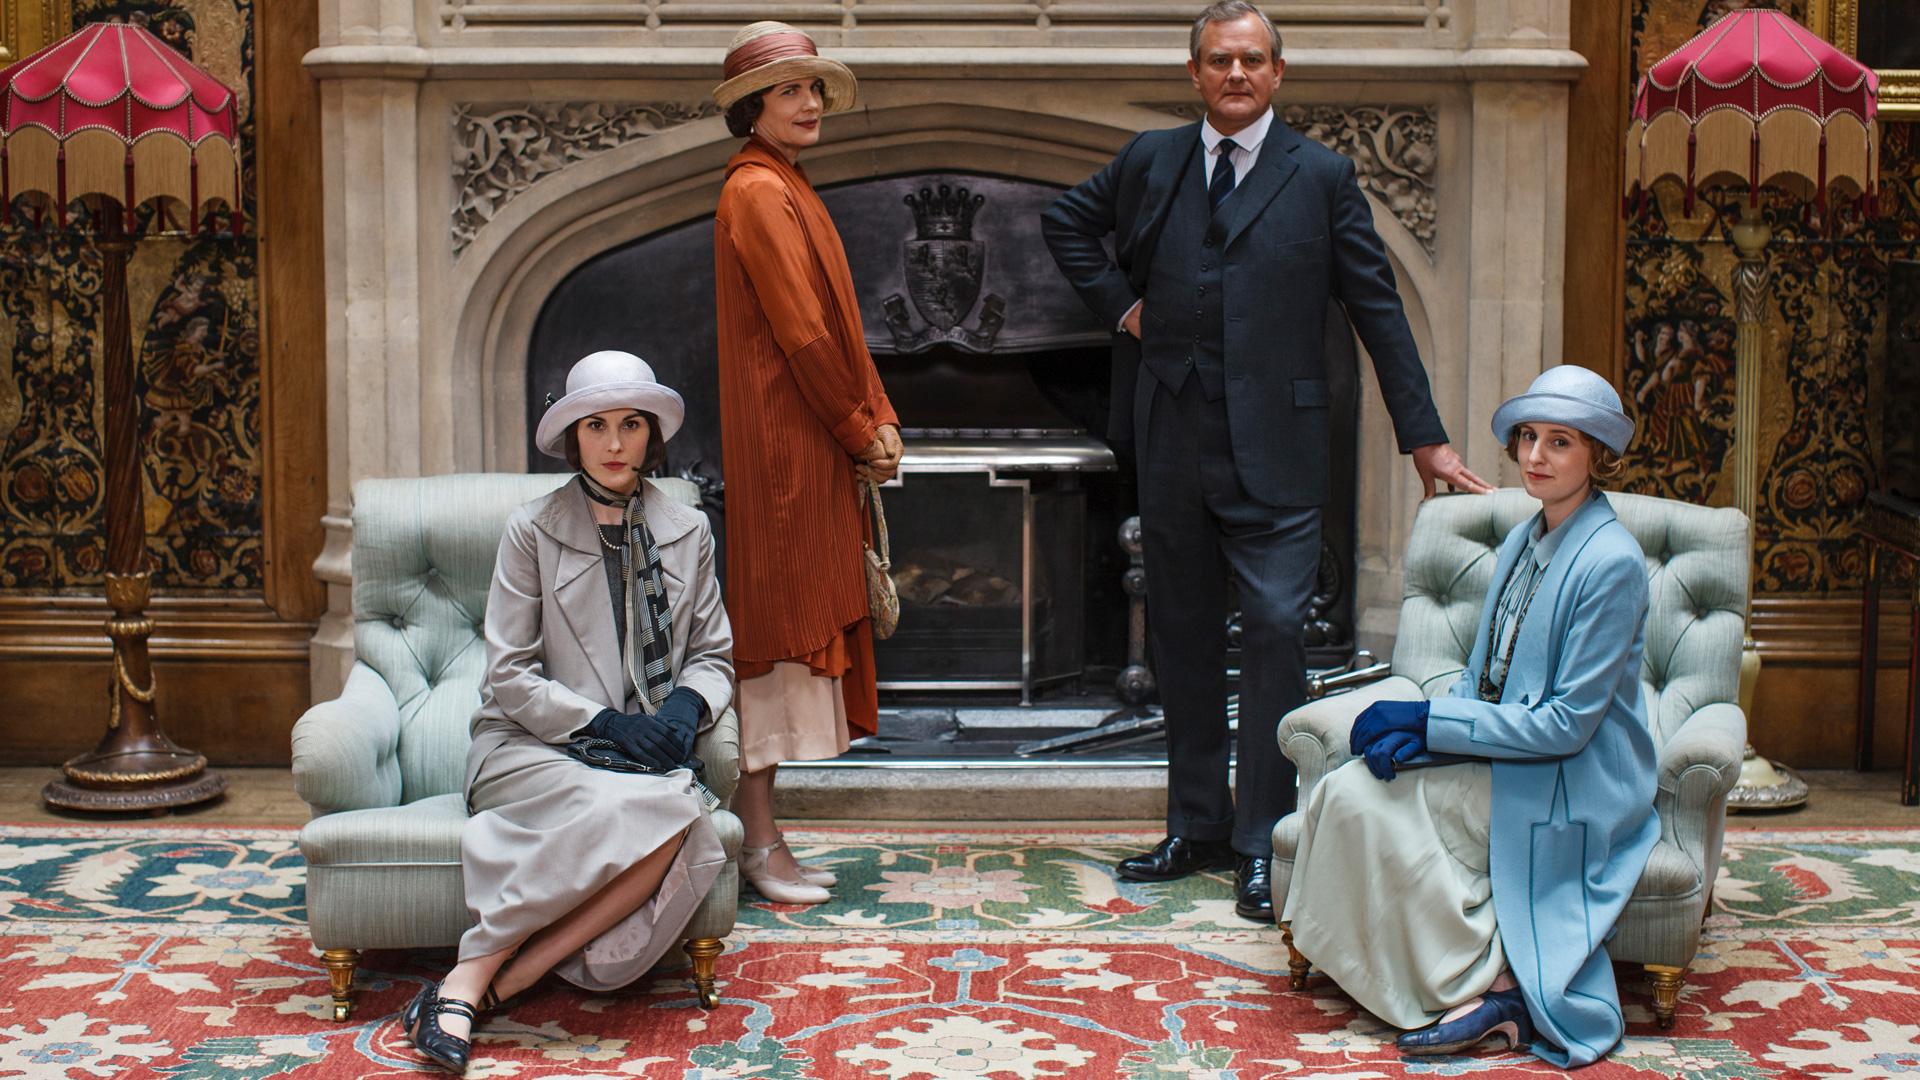 Downton Abbey Season 6 Primer Where We Left Off Season 6